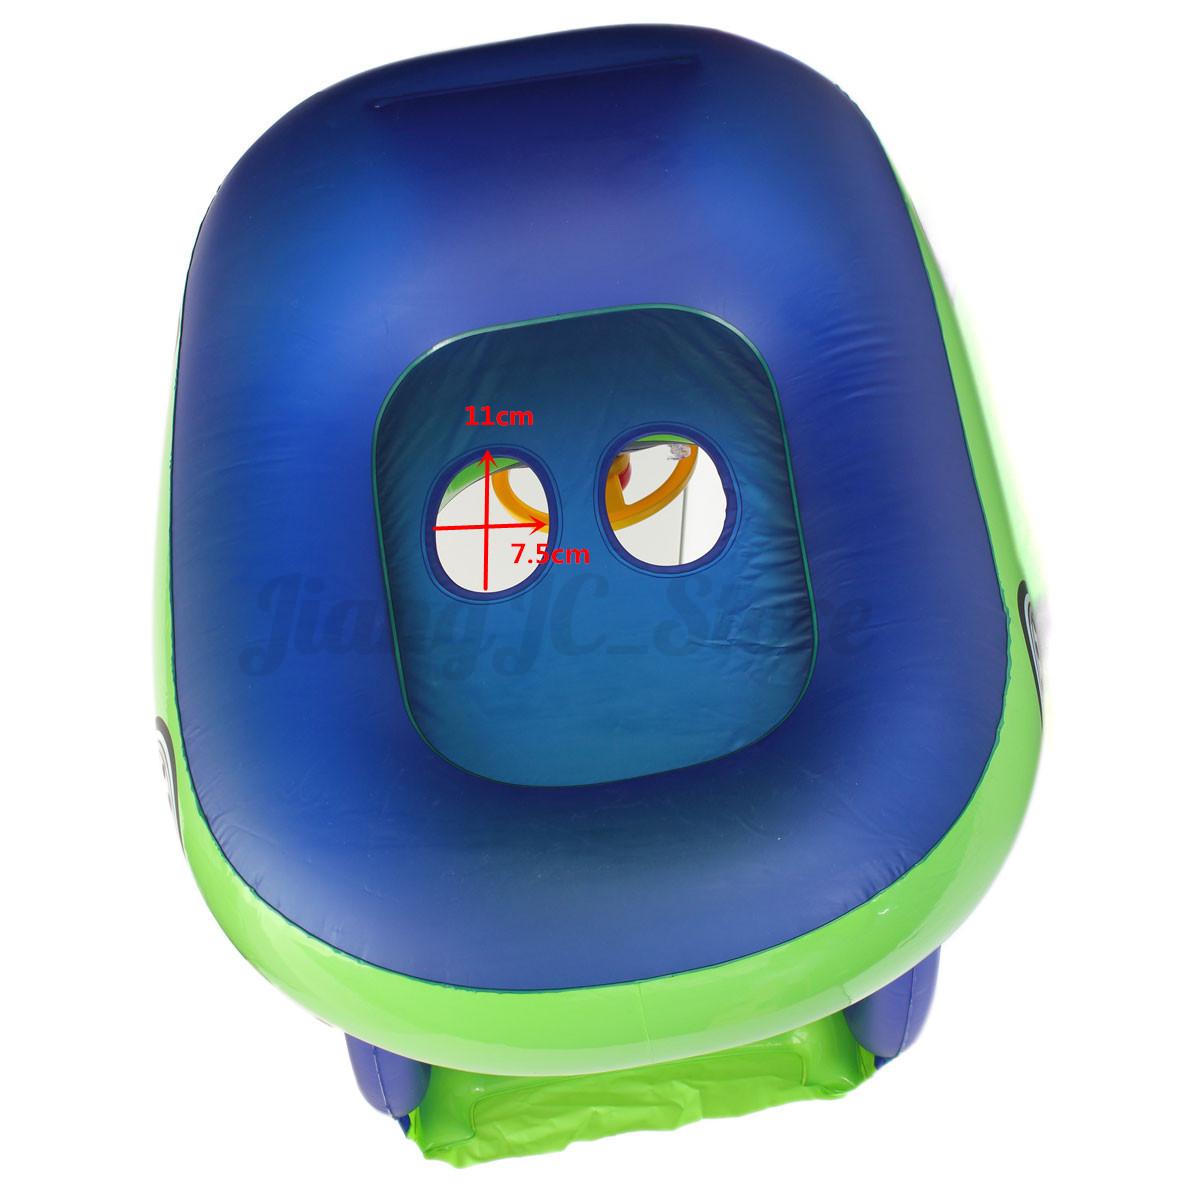 Blue Green Sunshade Baby Float Seat Car Boat Inflatable Swim Ring Pool Water Fun Ebay